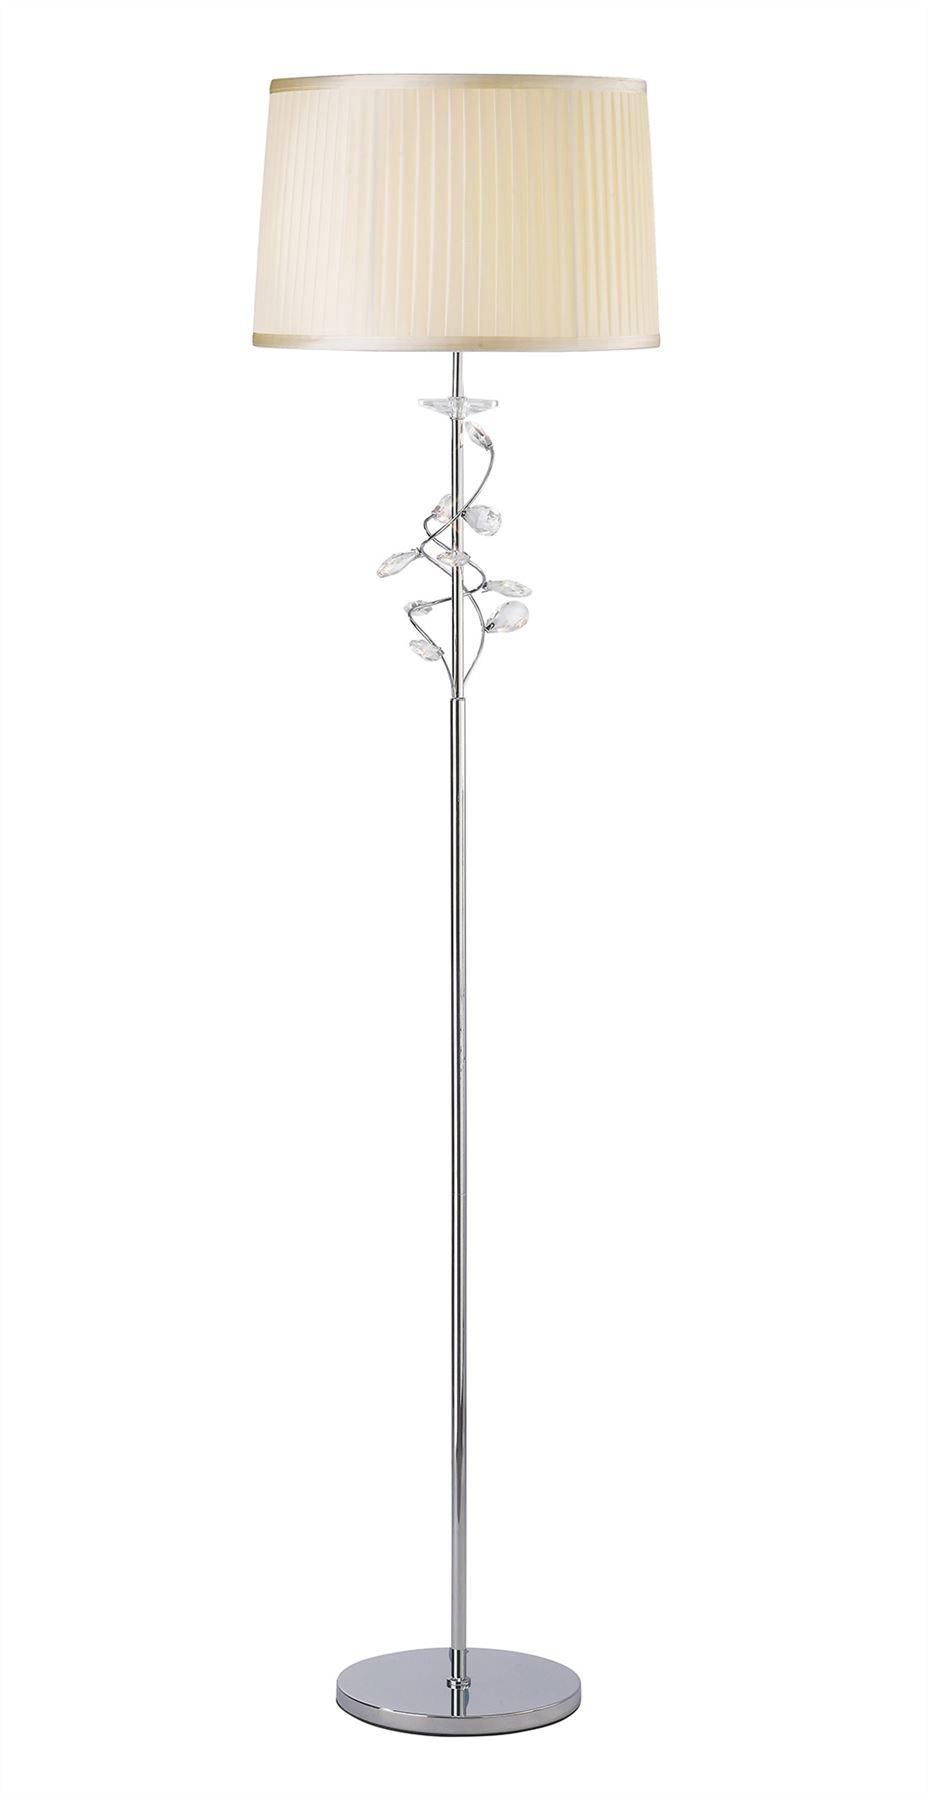 Elegant Willow 1 Light Floor Lamp With Cream Shade - Polished Chrome Finish